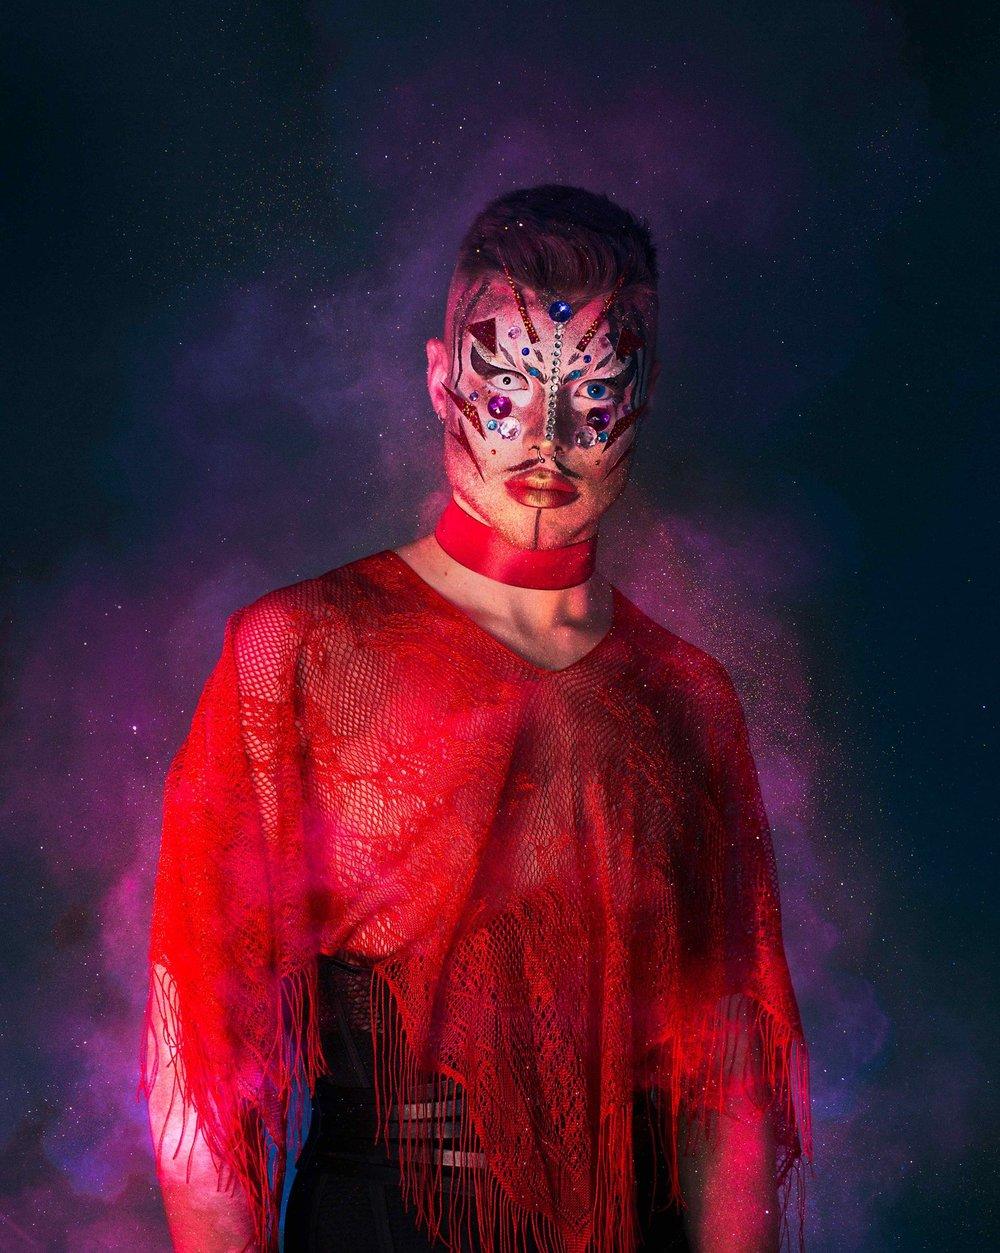 Phanta Drag queen artist dust by toronto commercial fashion photographer justin atkins.jpg.jpg.jpg.jpg